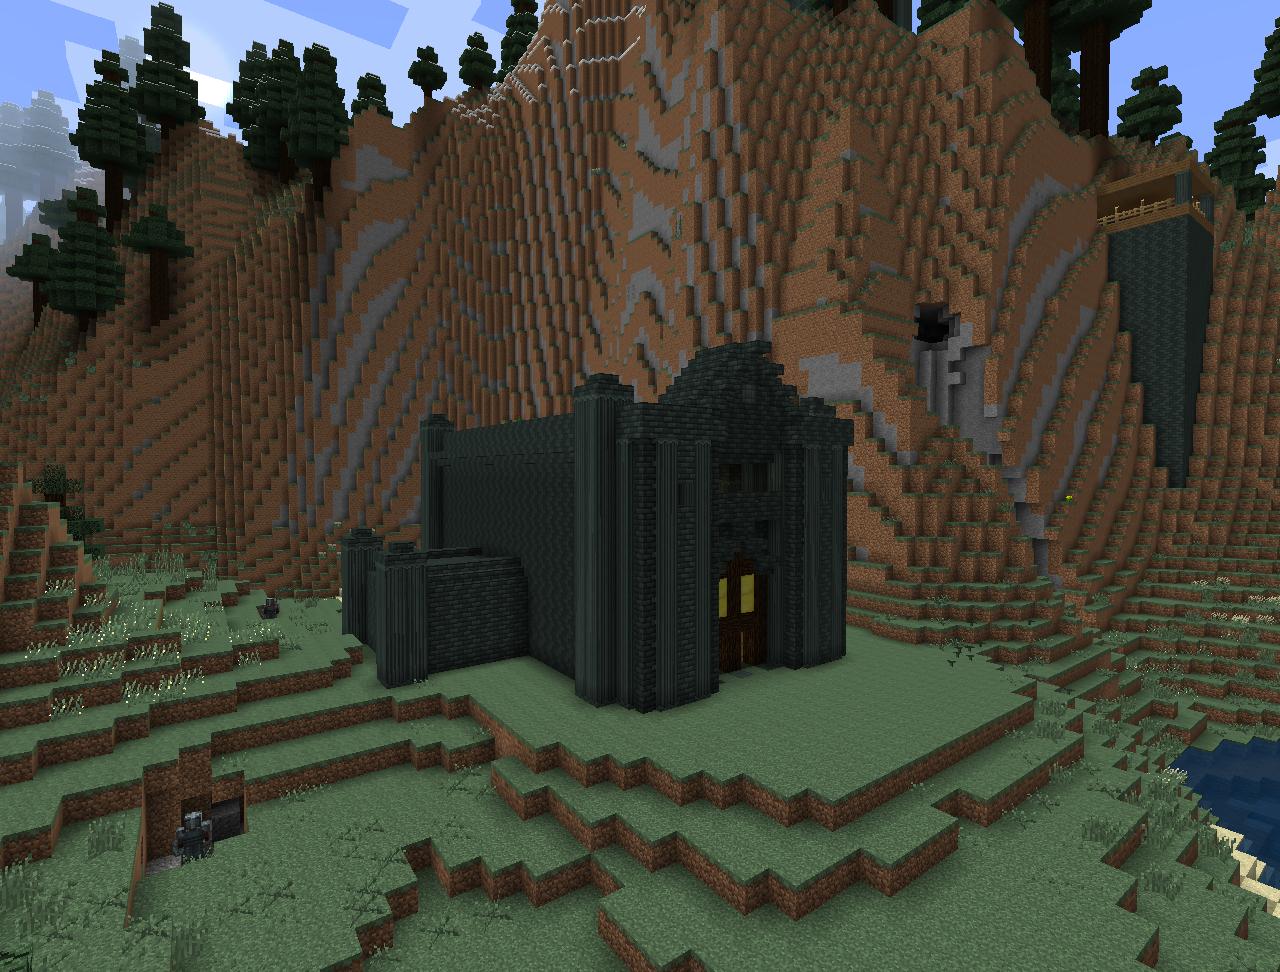 Lotr dwarf city minecraft